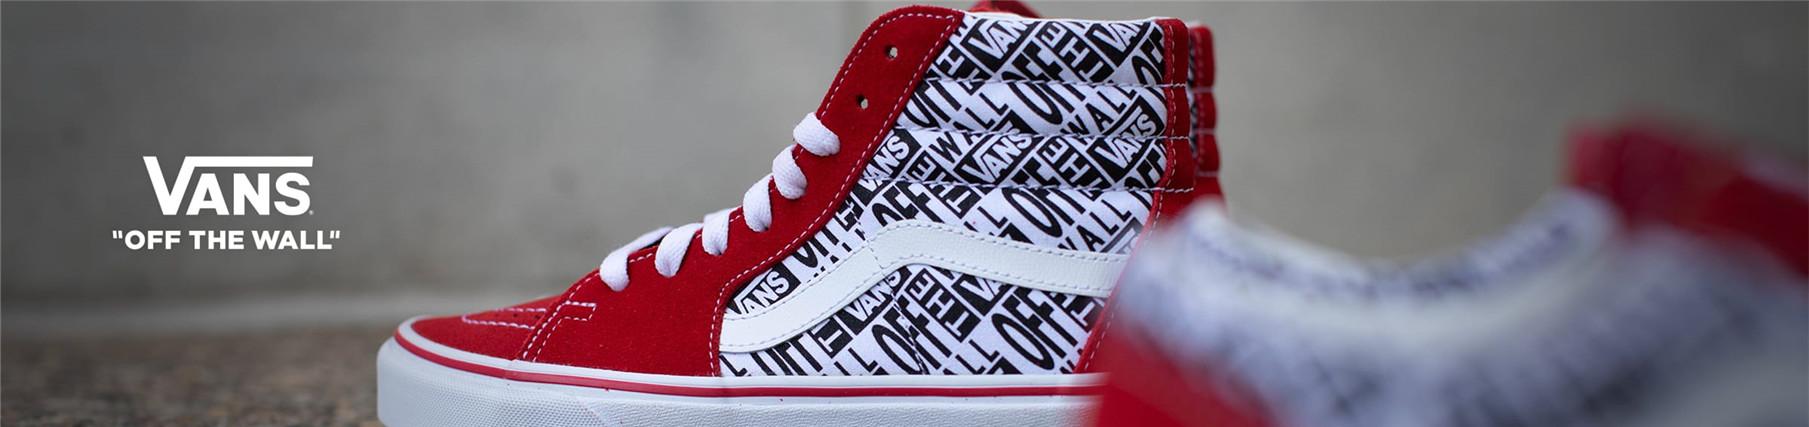 Vans Shoes Mid Top